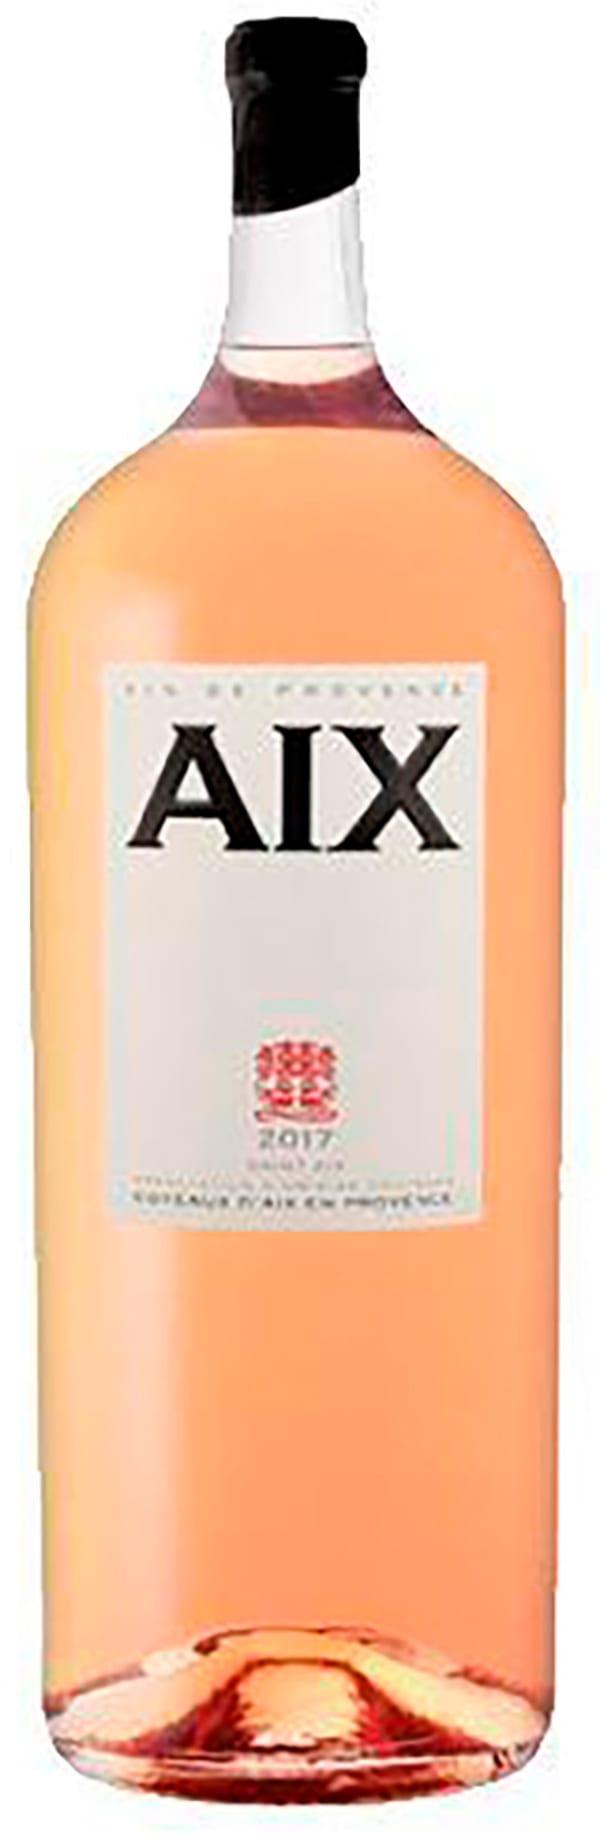 Aix Provence Rosé Mathusalem 2017